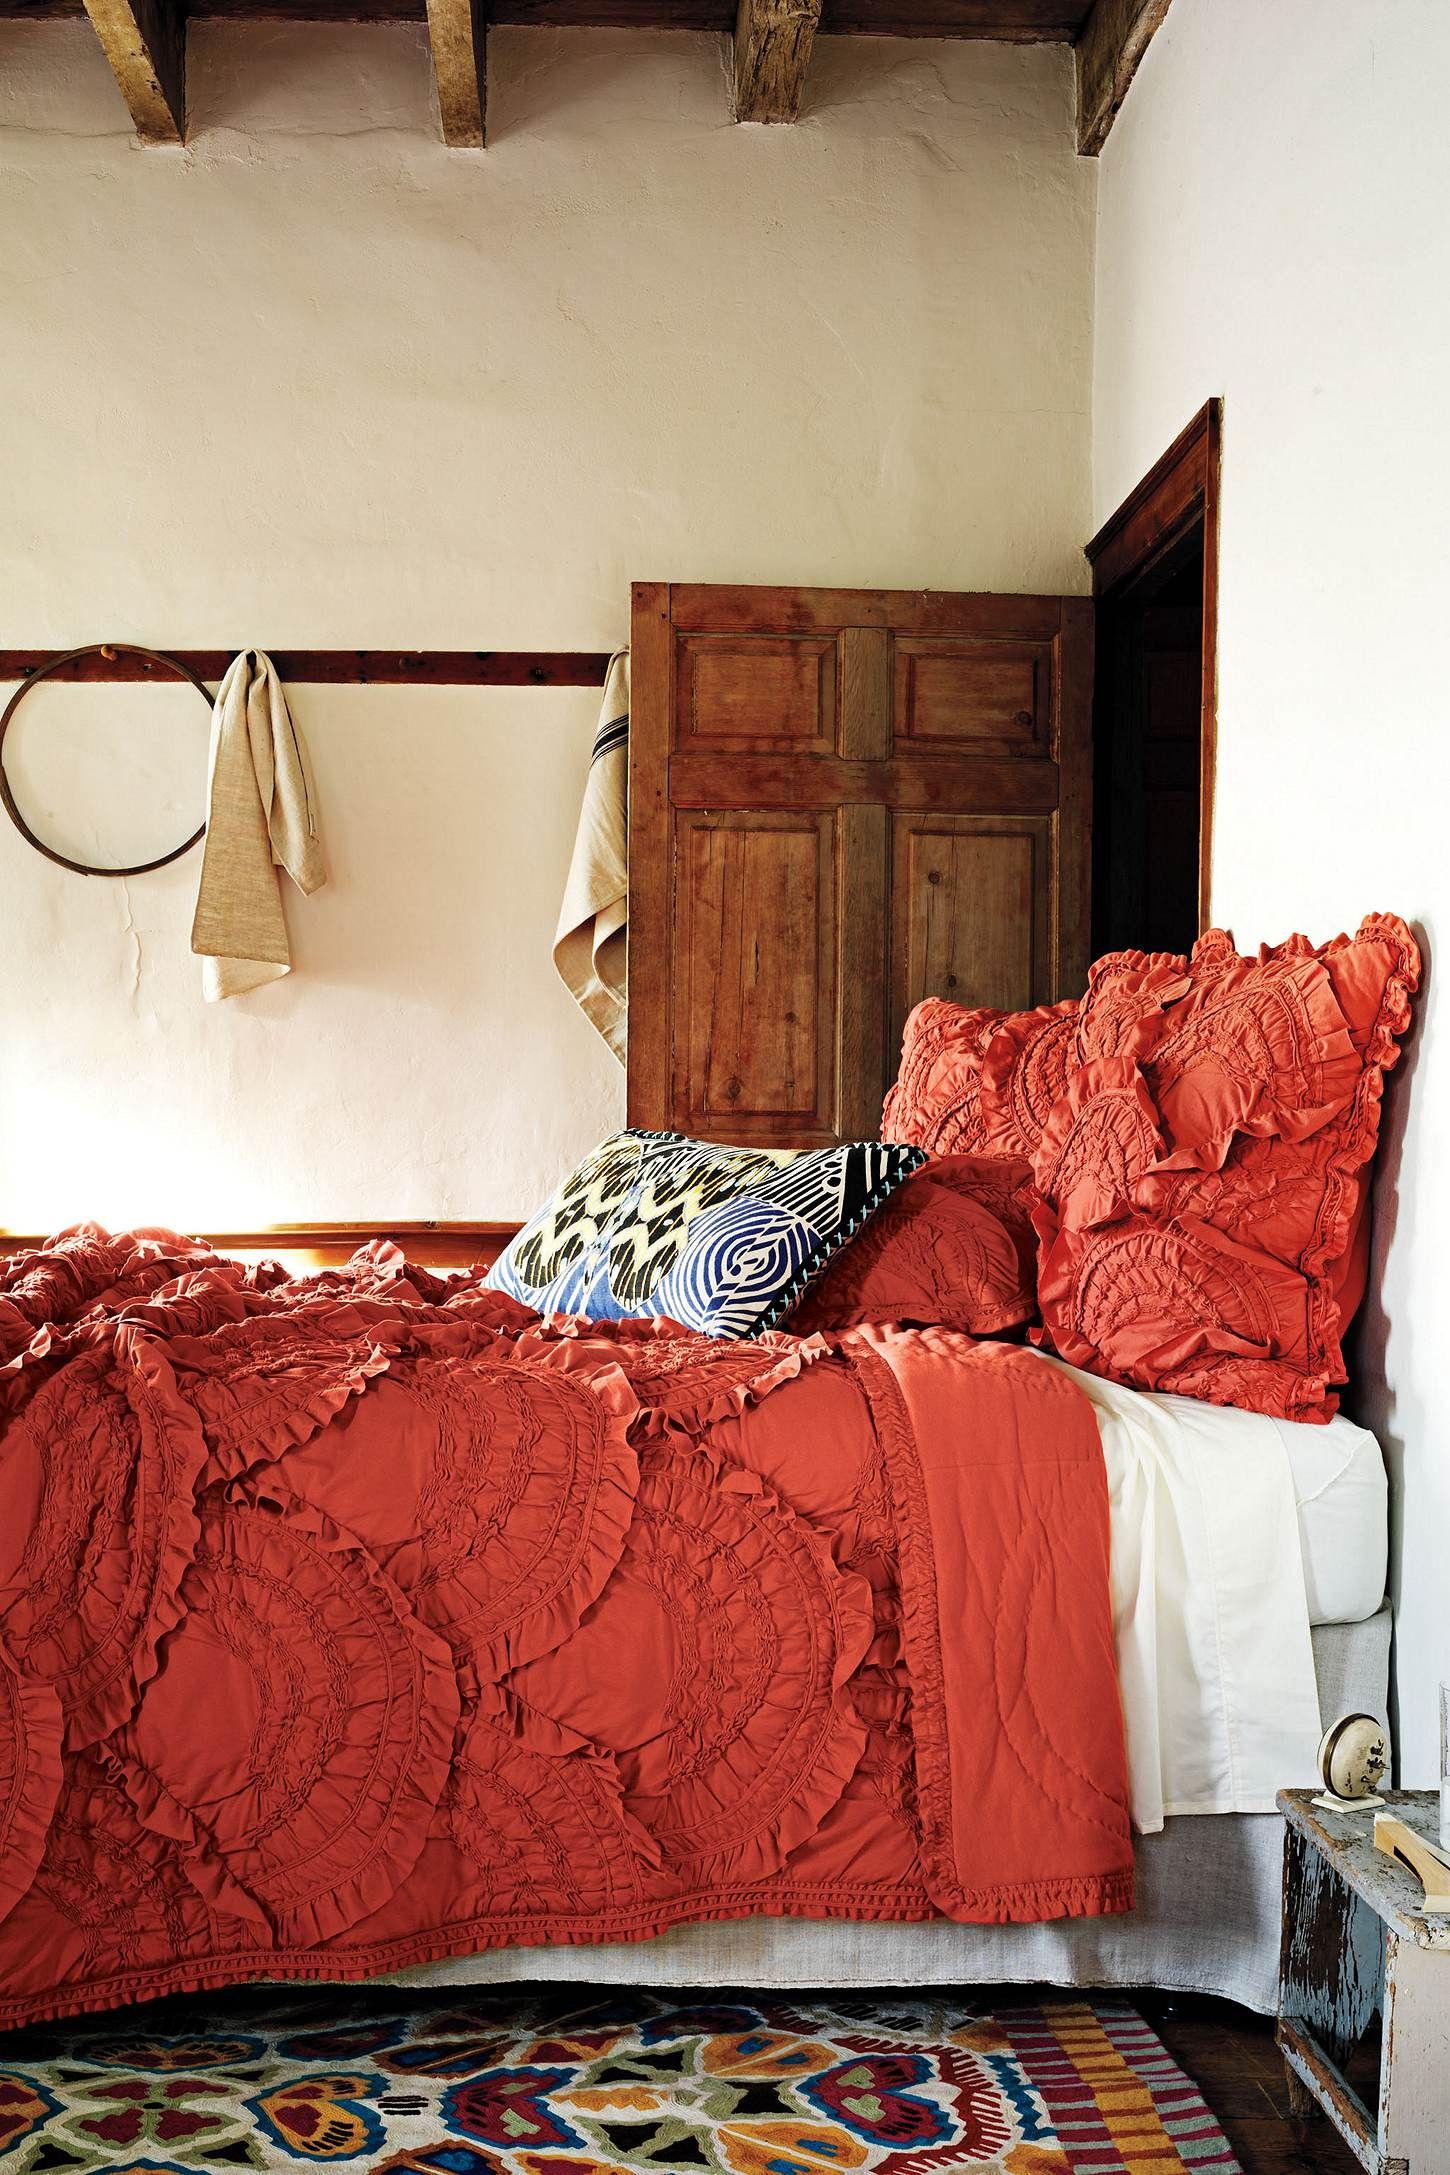 Anthropologie Bedding C A S E Atelier Couture Crochet